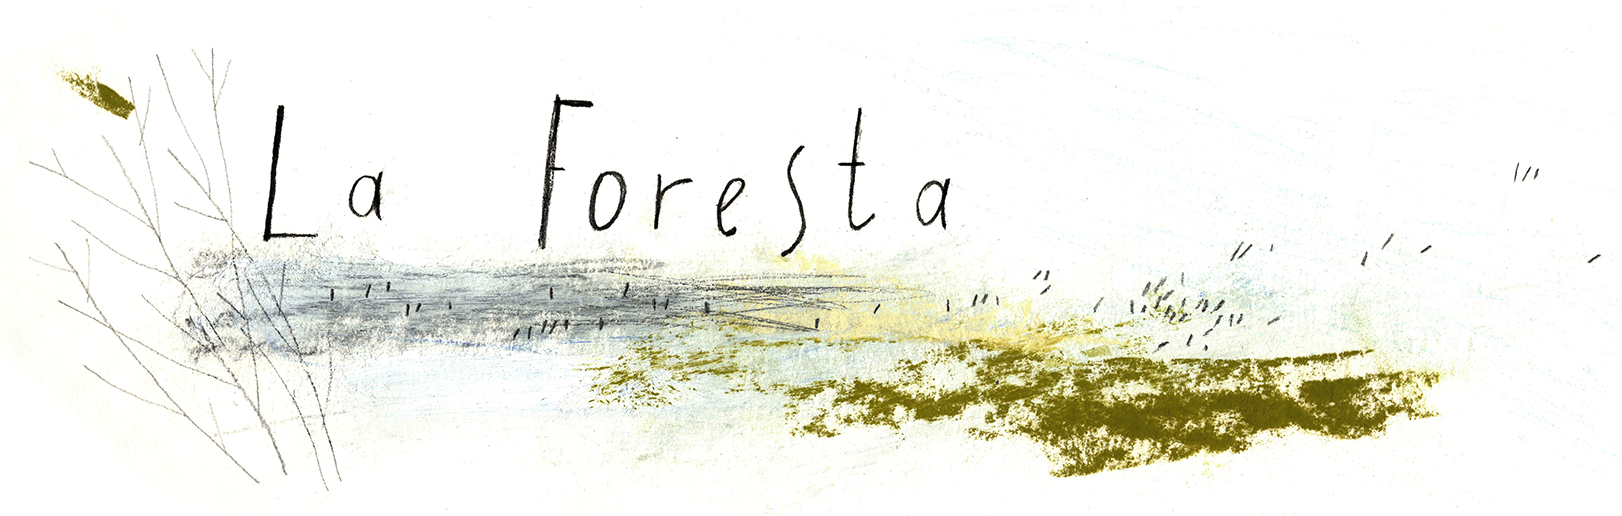 la foresta1 150.png